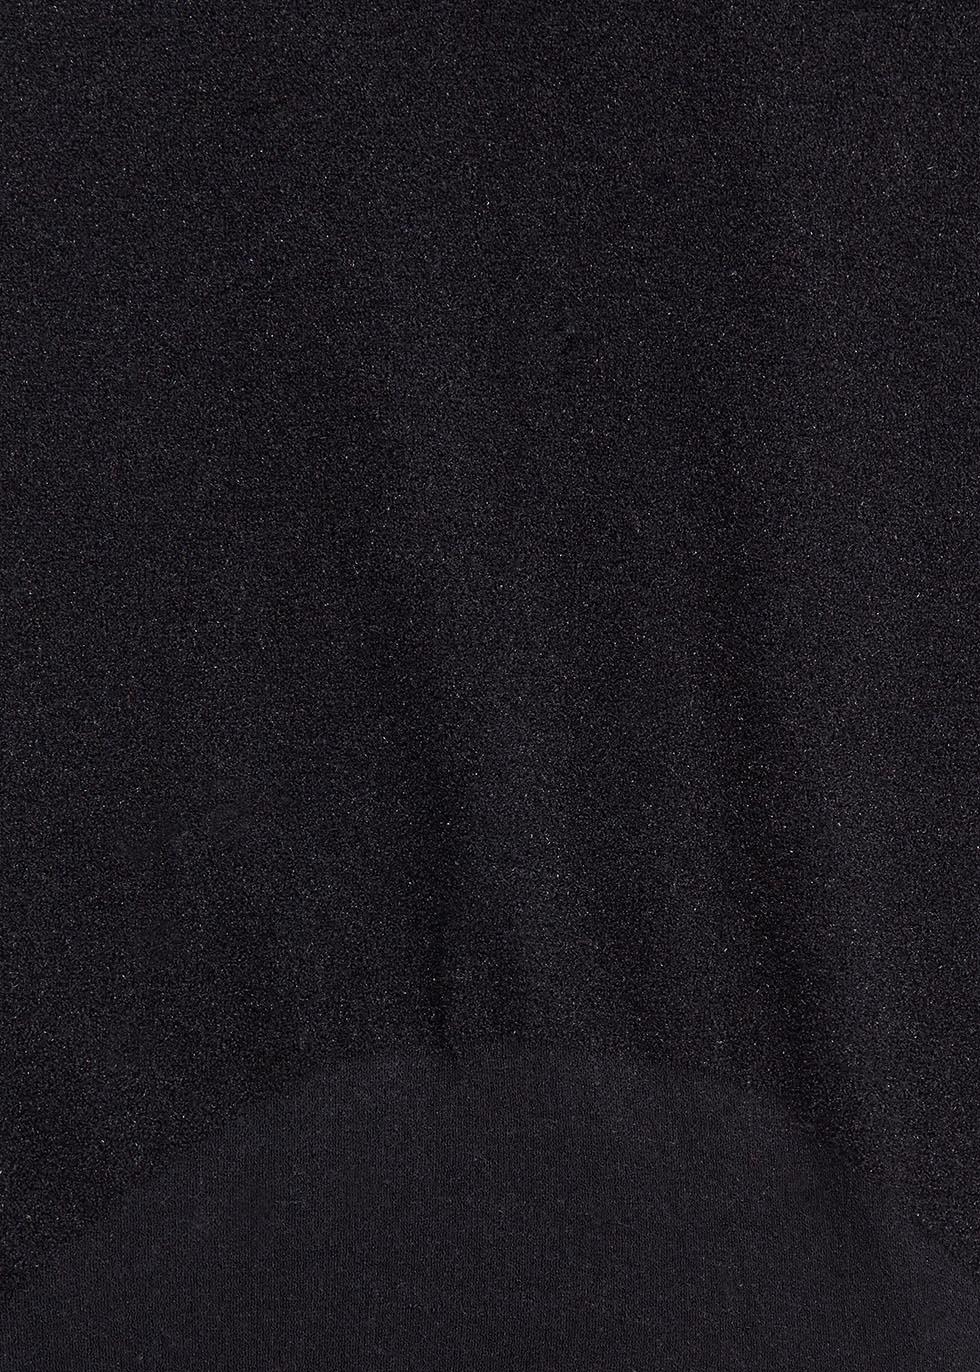 Pure black sheer 10 denier tights - Wolford